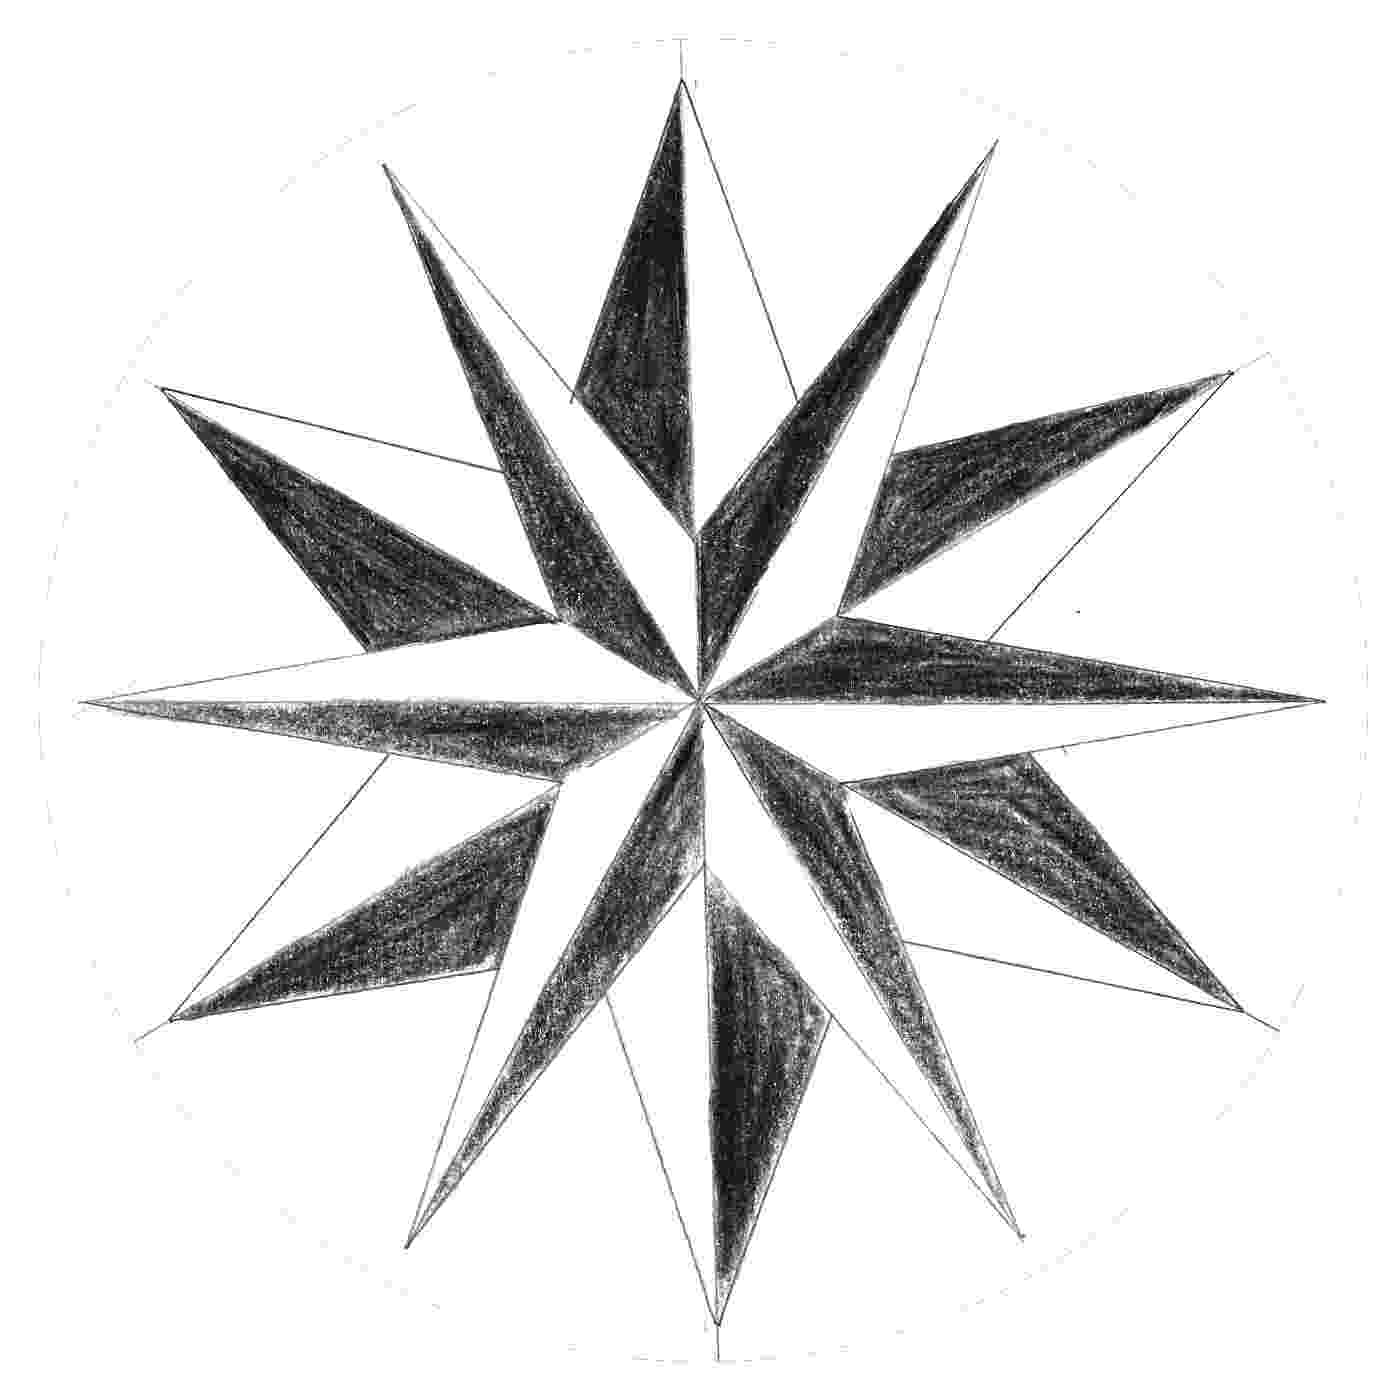 dibujos de estrellas de cinco puntas para imprimir star silhouette star shape sheriff shapes star outline para dibujos cinco puntas de imprimir de estrellas